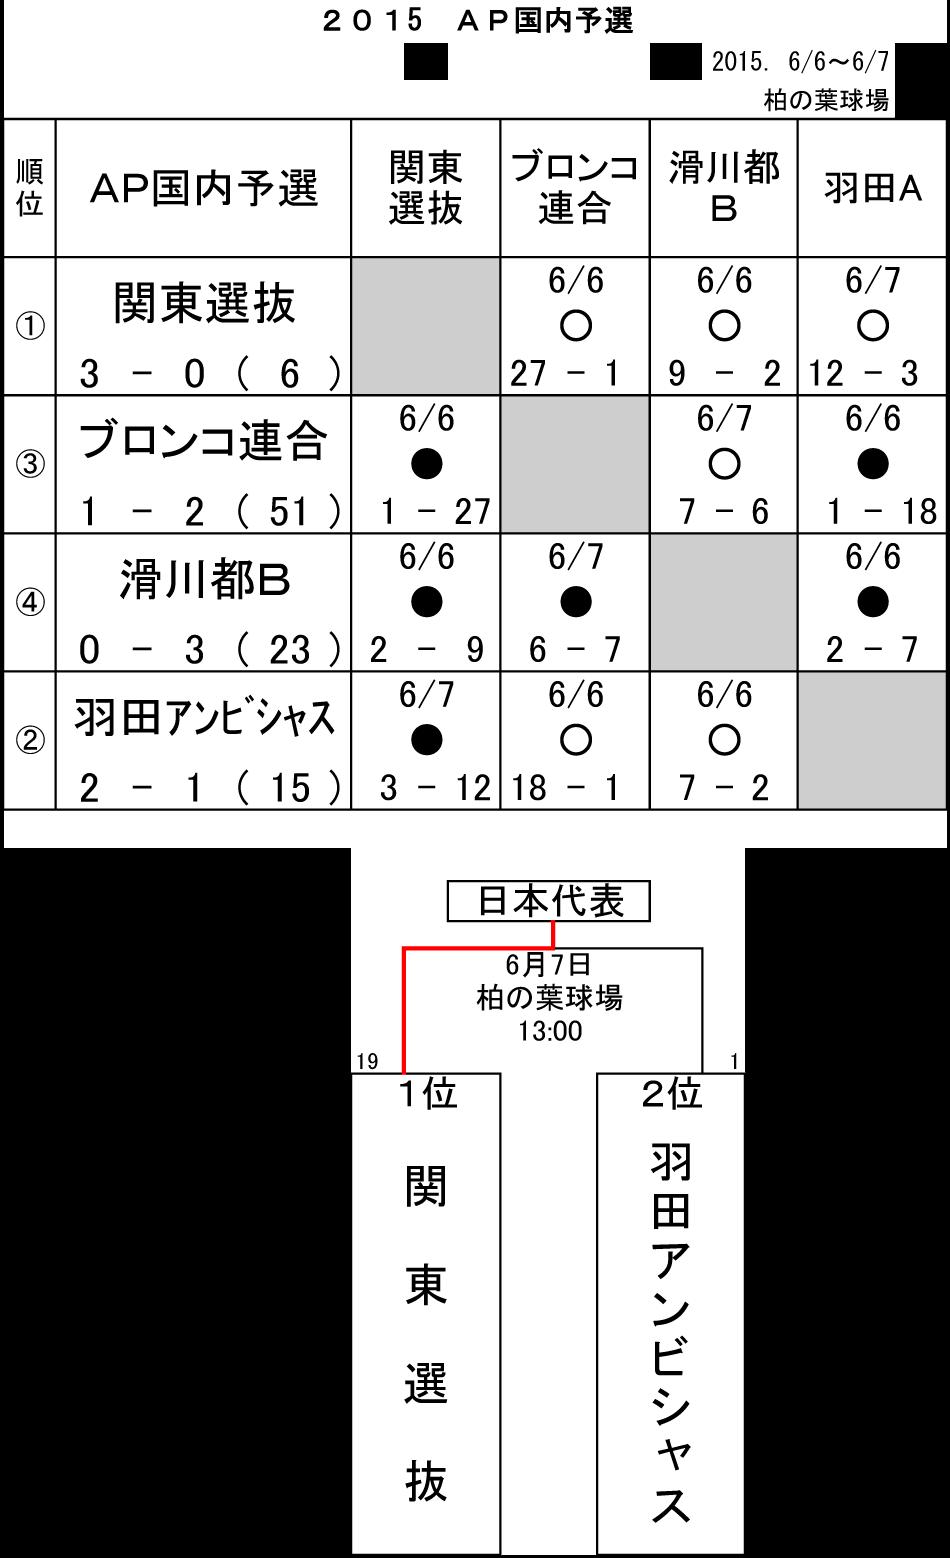 2015ap_bronco_yosen_result